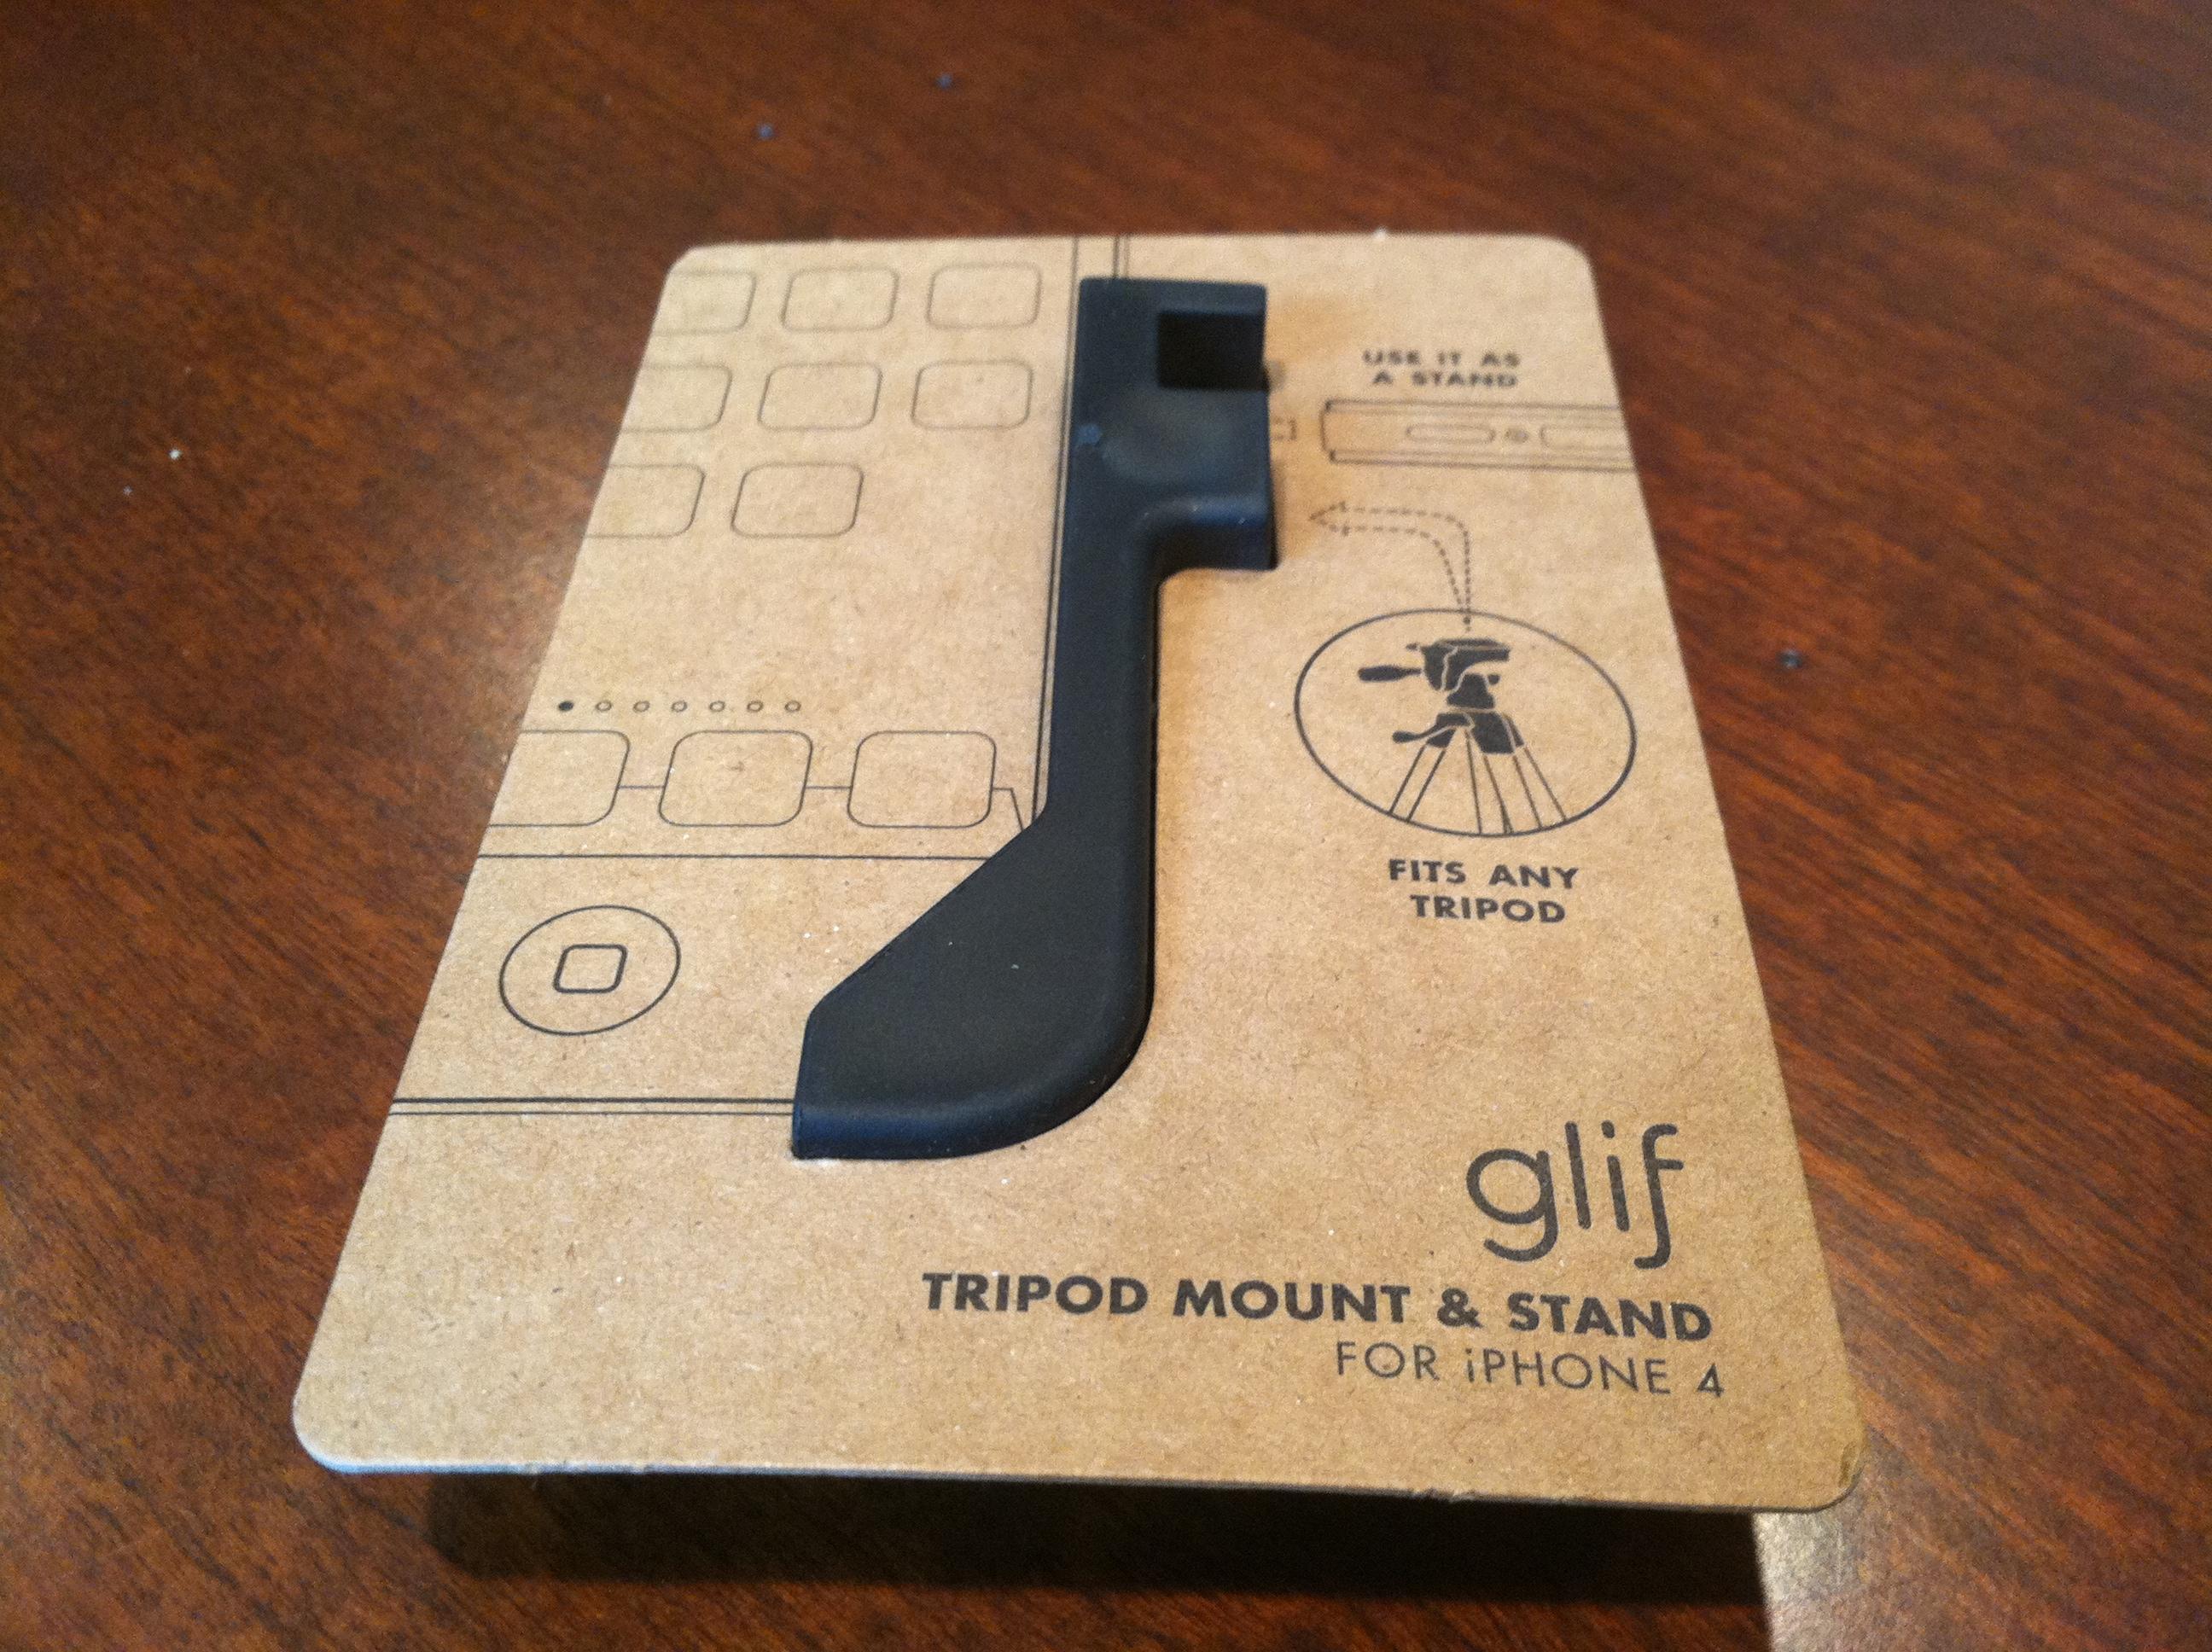 Apple iPhone Glif Tripod Mount